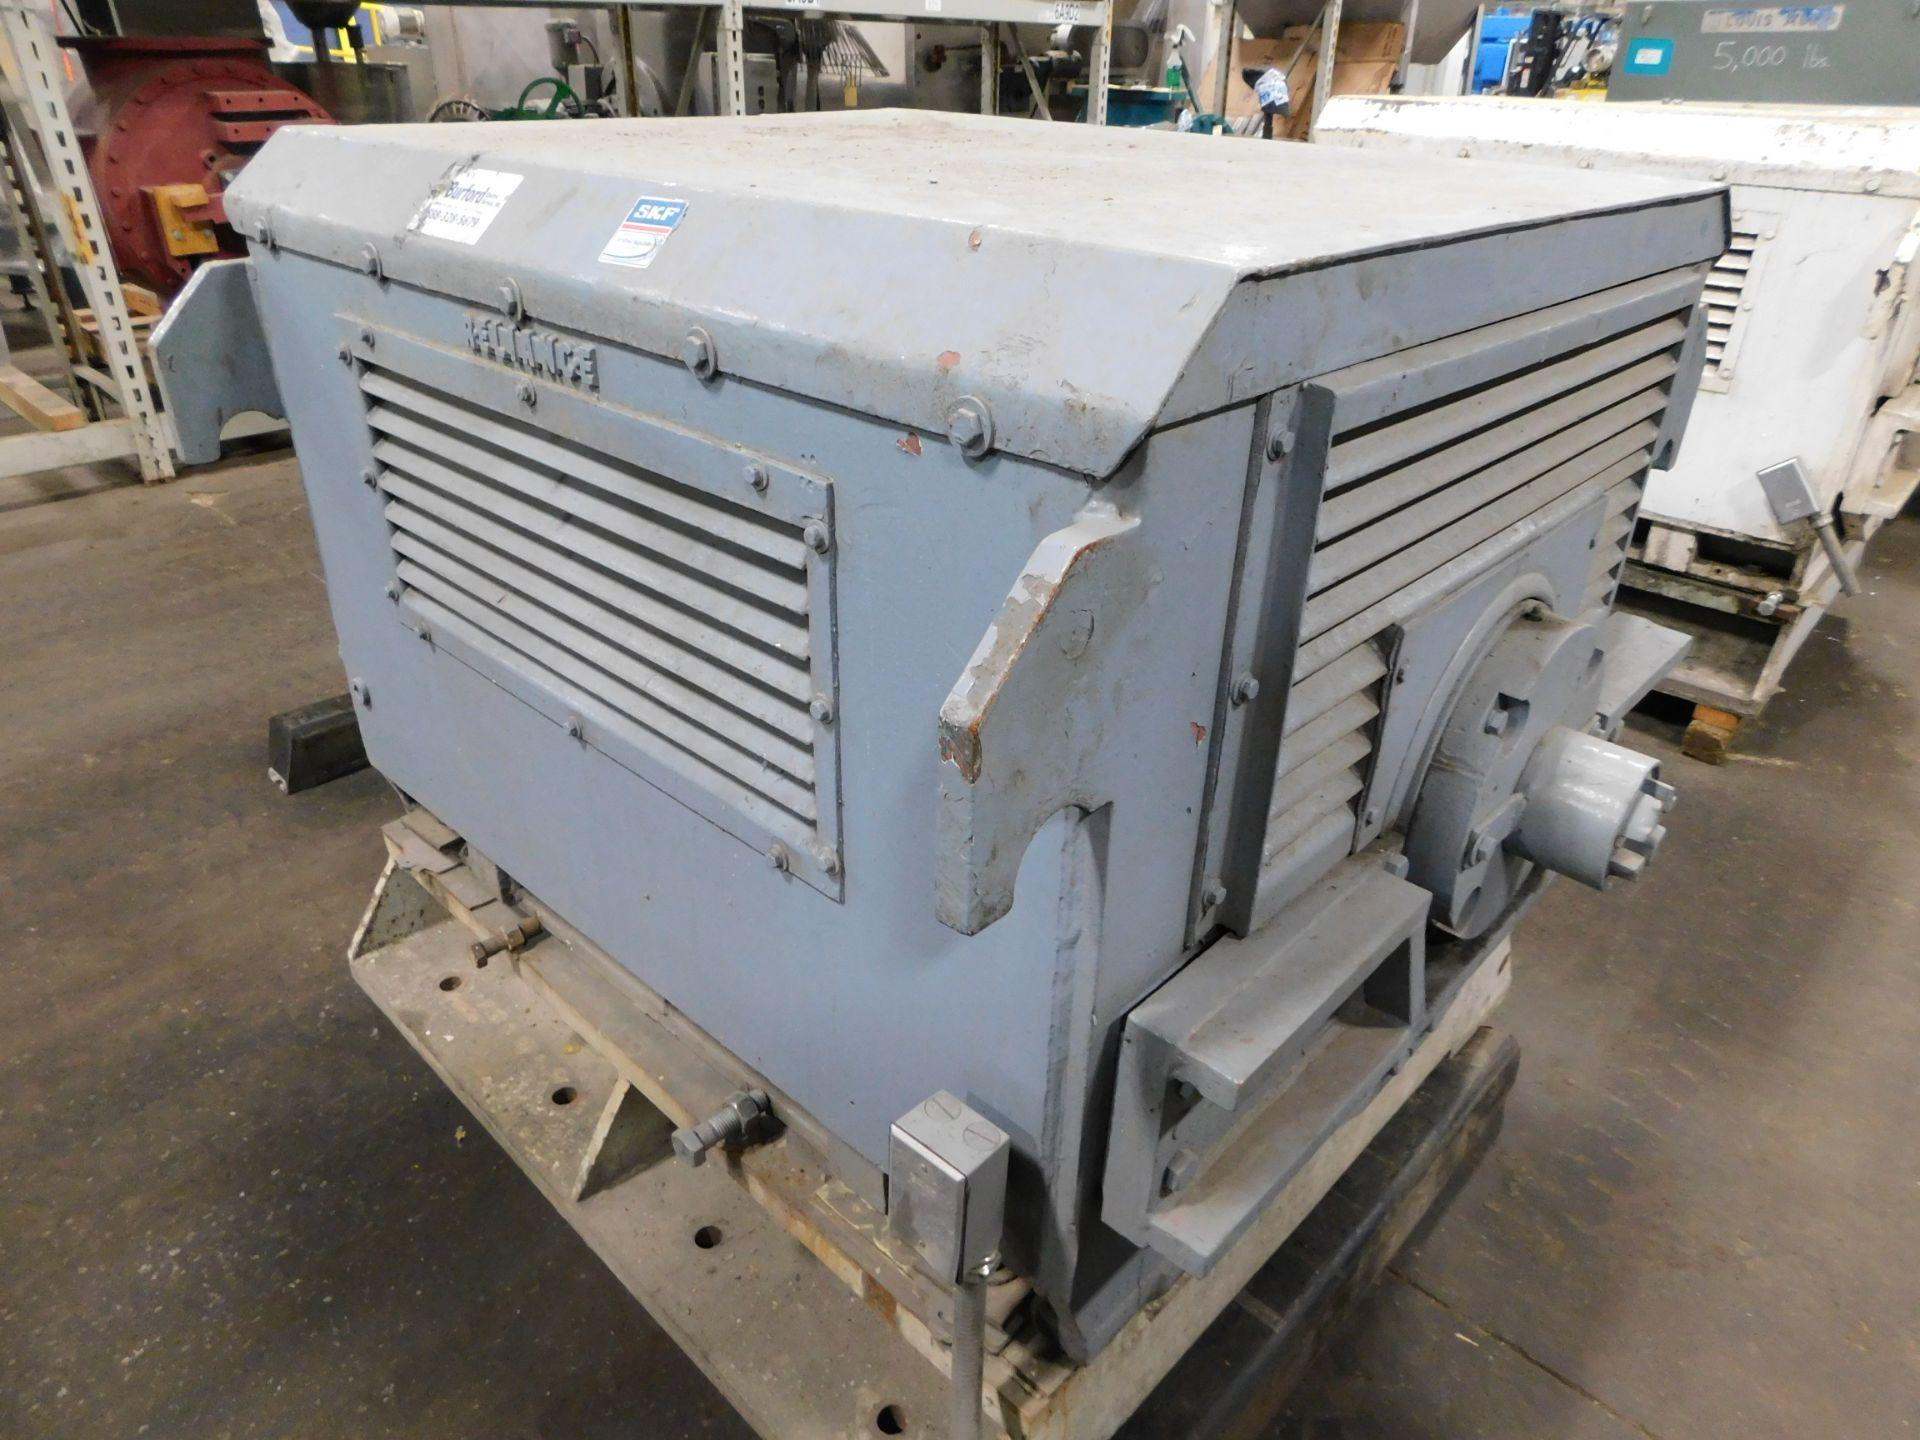 Reliance AC Duty Master Motor. 900 HP. 3 Ph. 60 Hz. 4160 V. 1789 RPM. 6809S. Type P. - Image 5 of 10